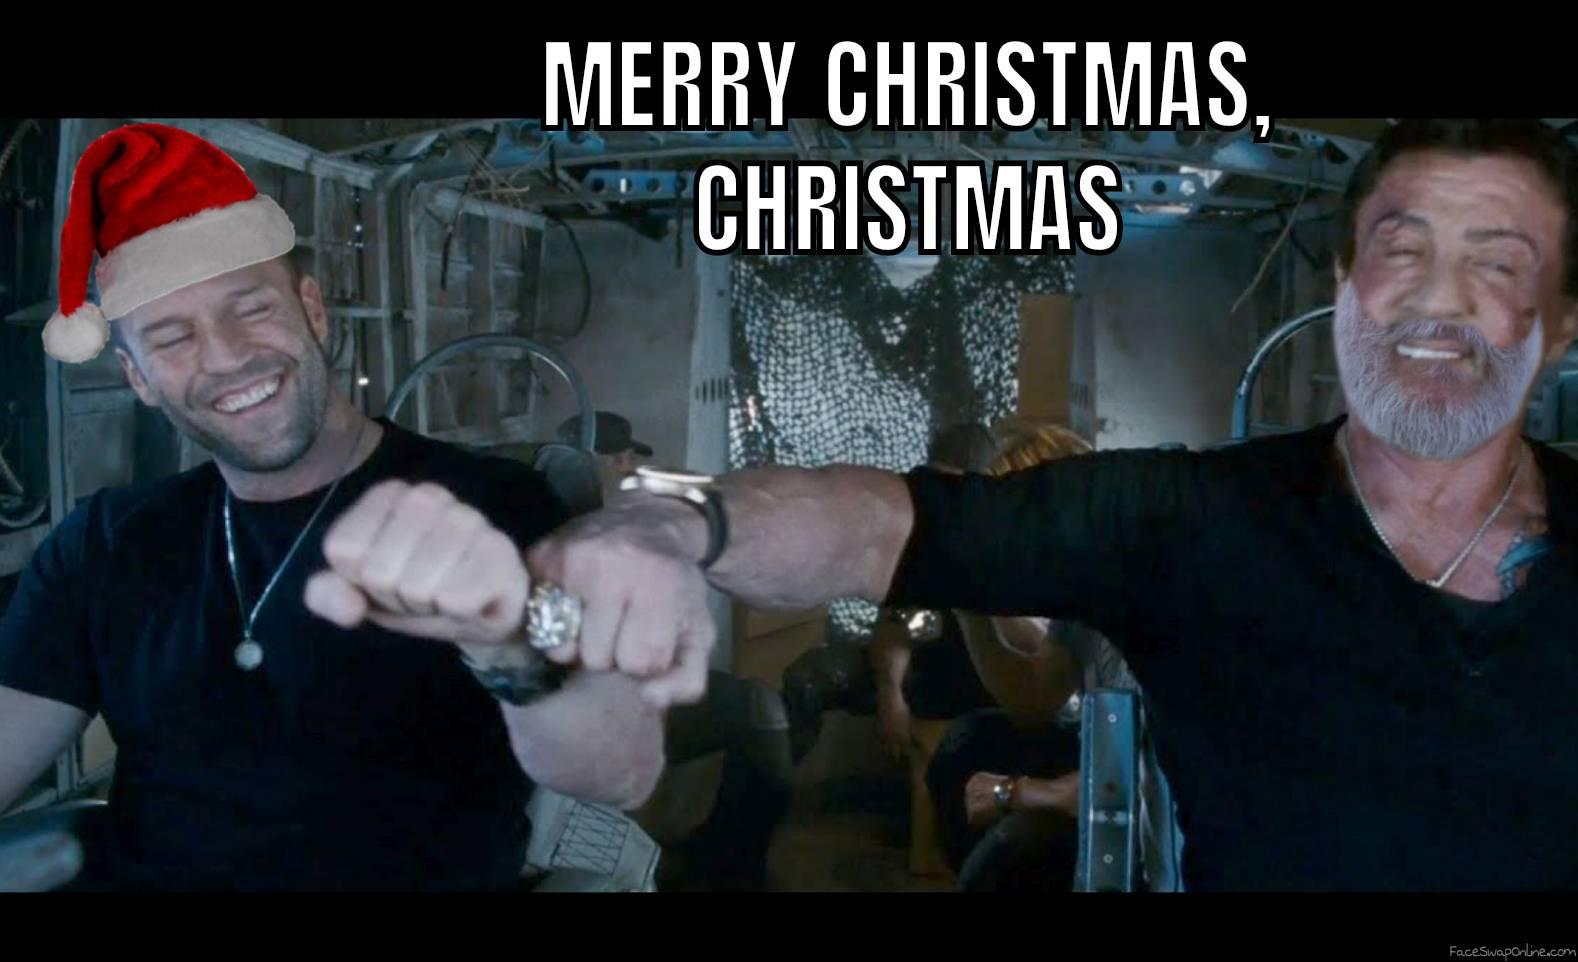 When Lee Christmas celebrates Christmas